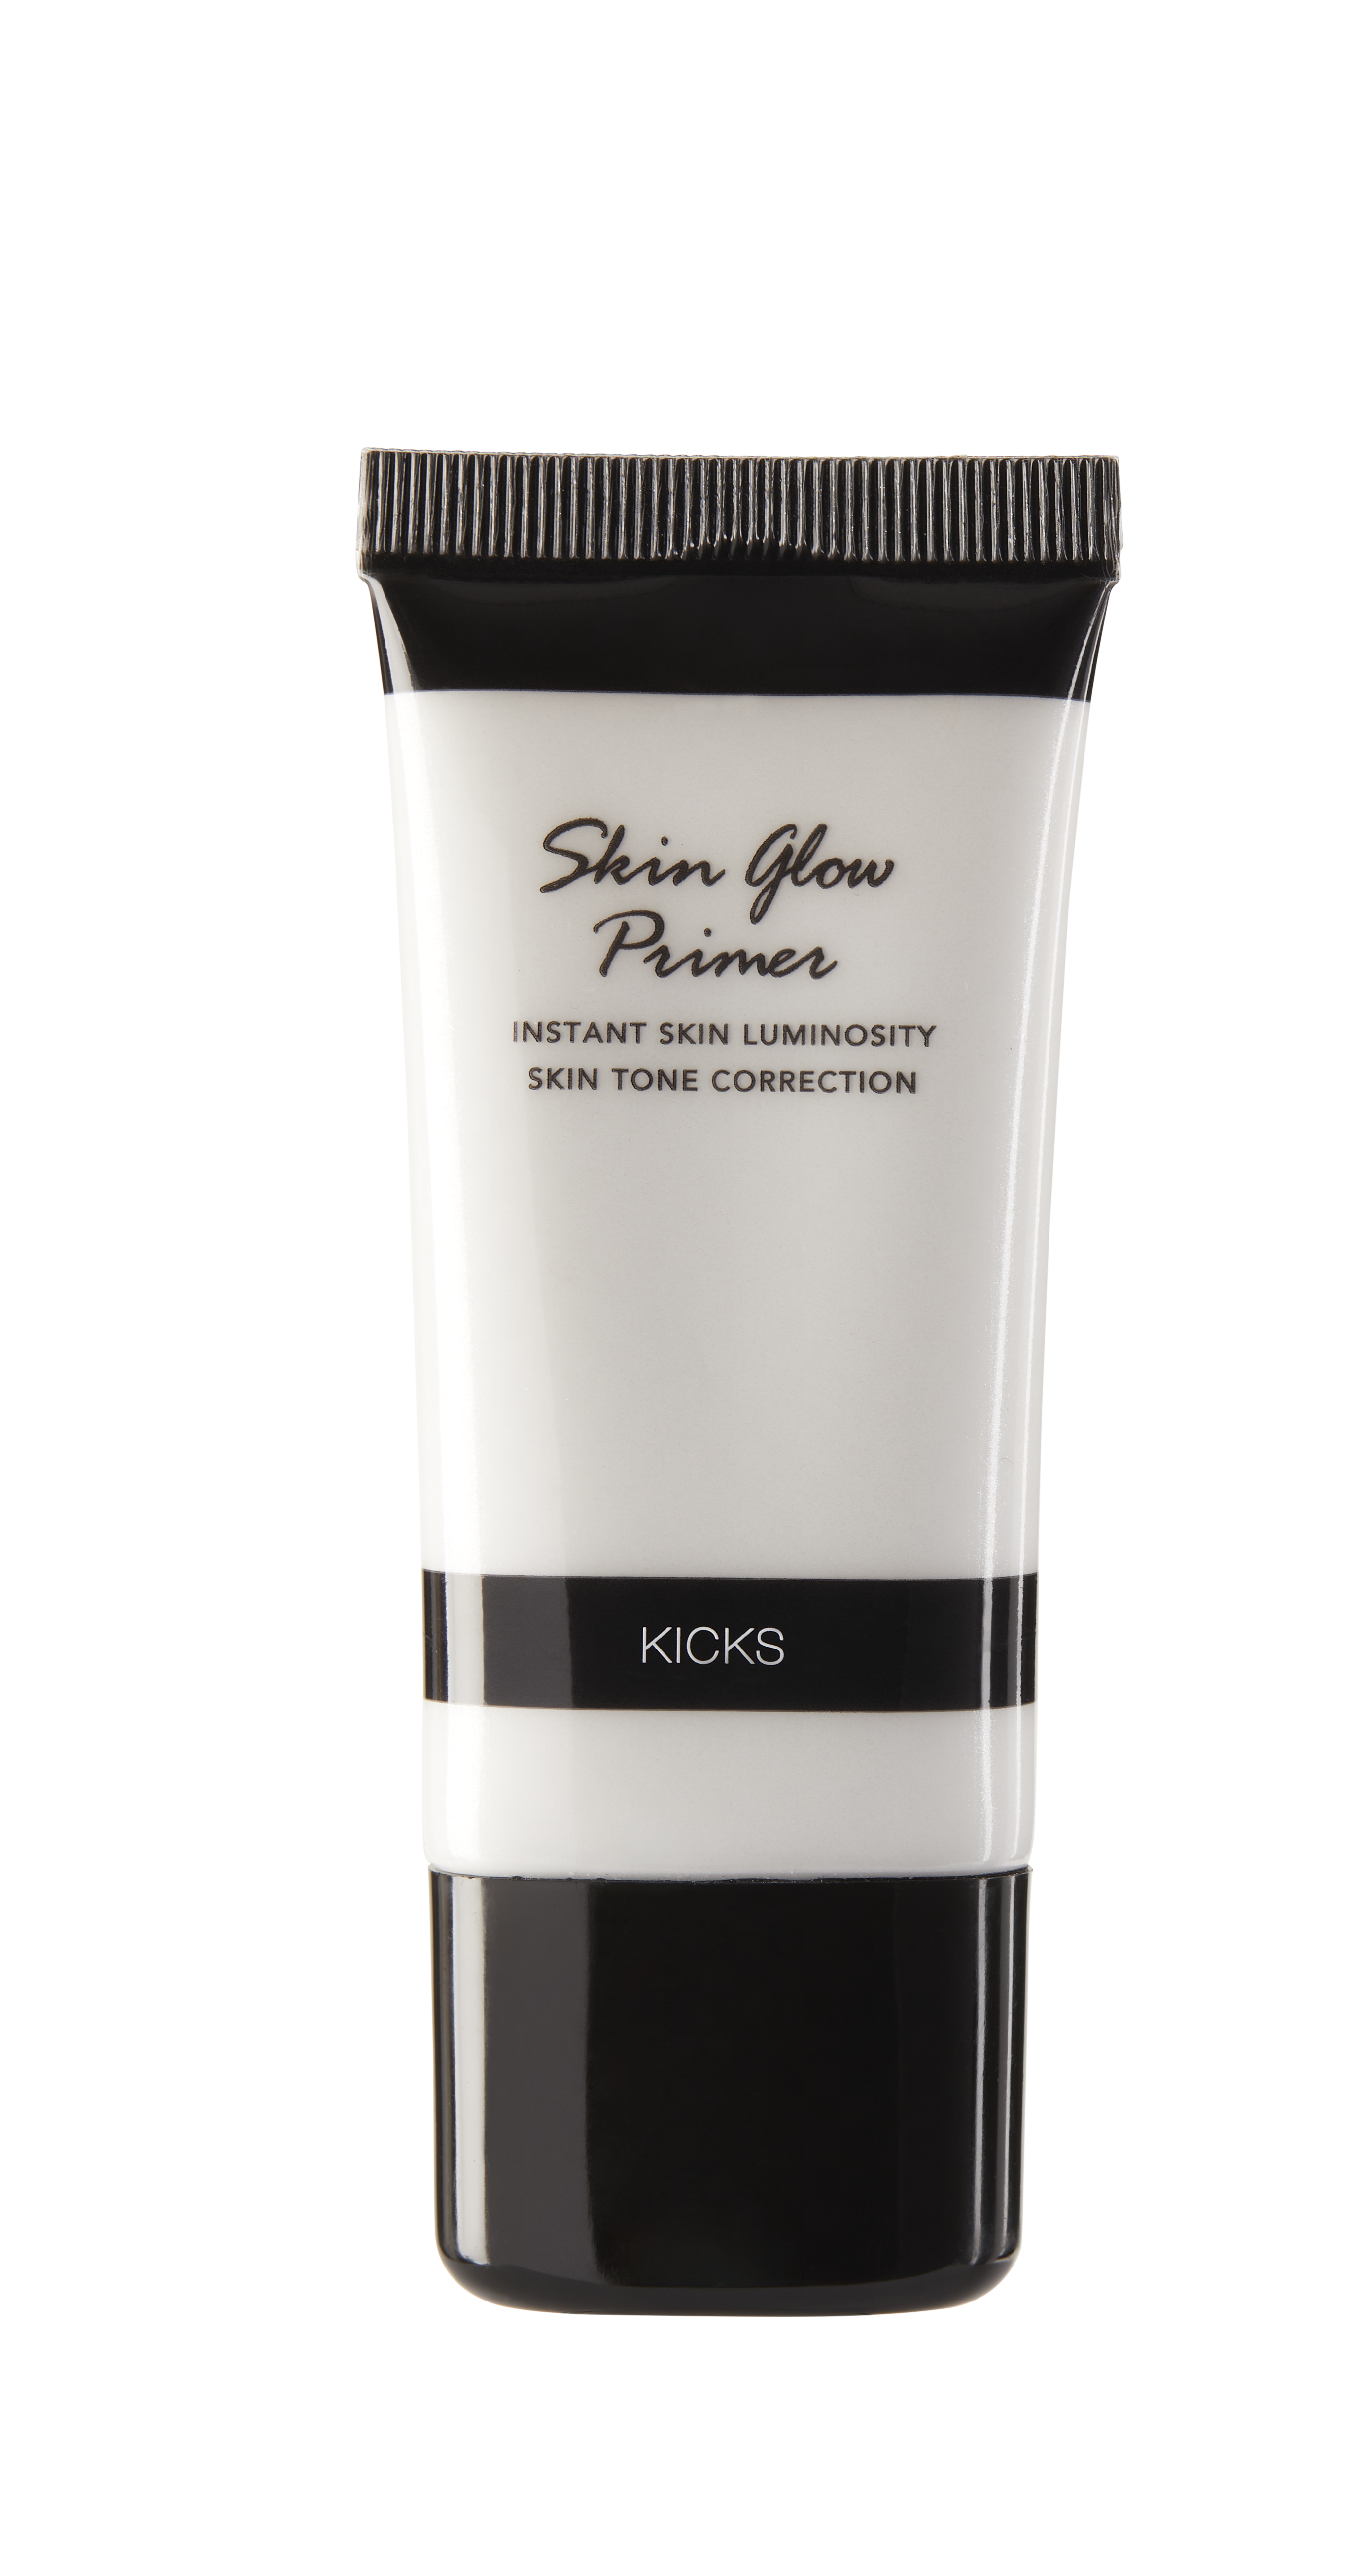 Skin Glow Primer